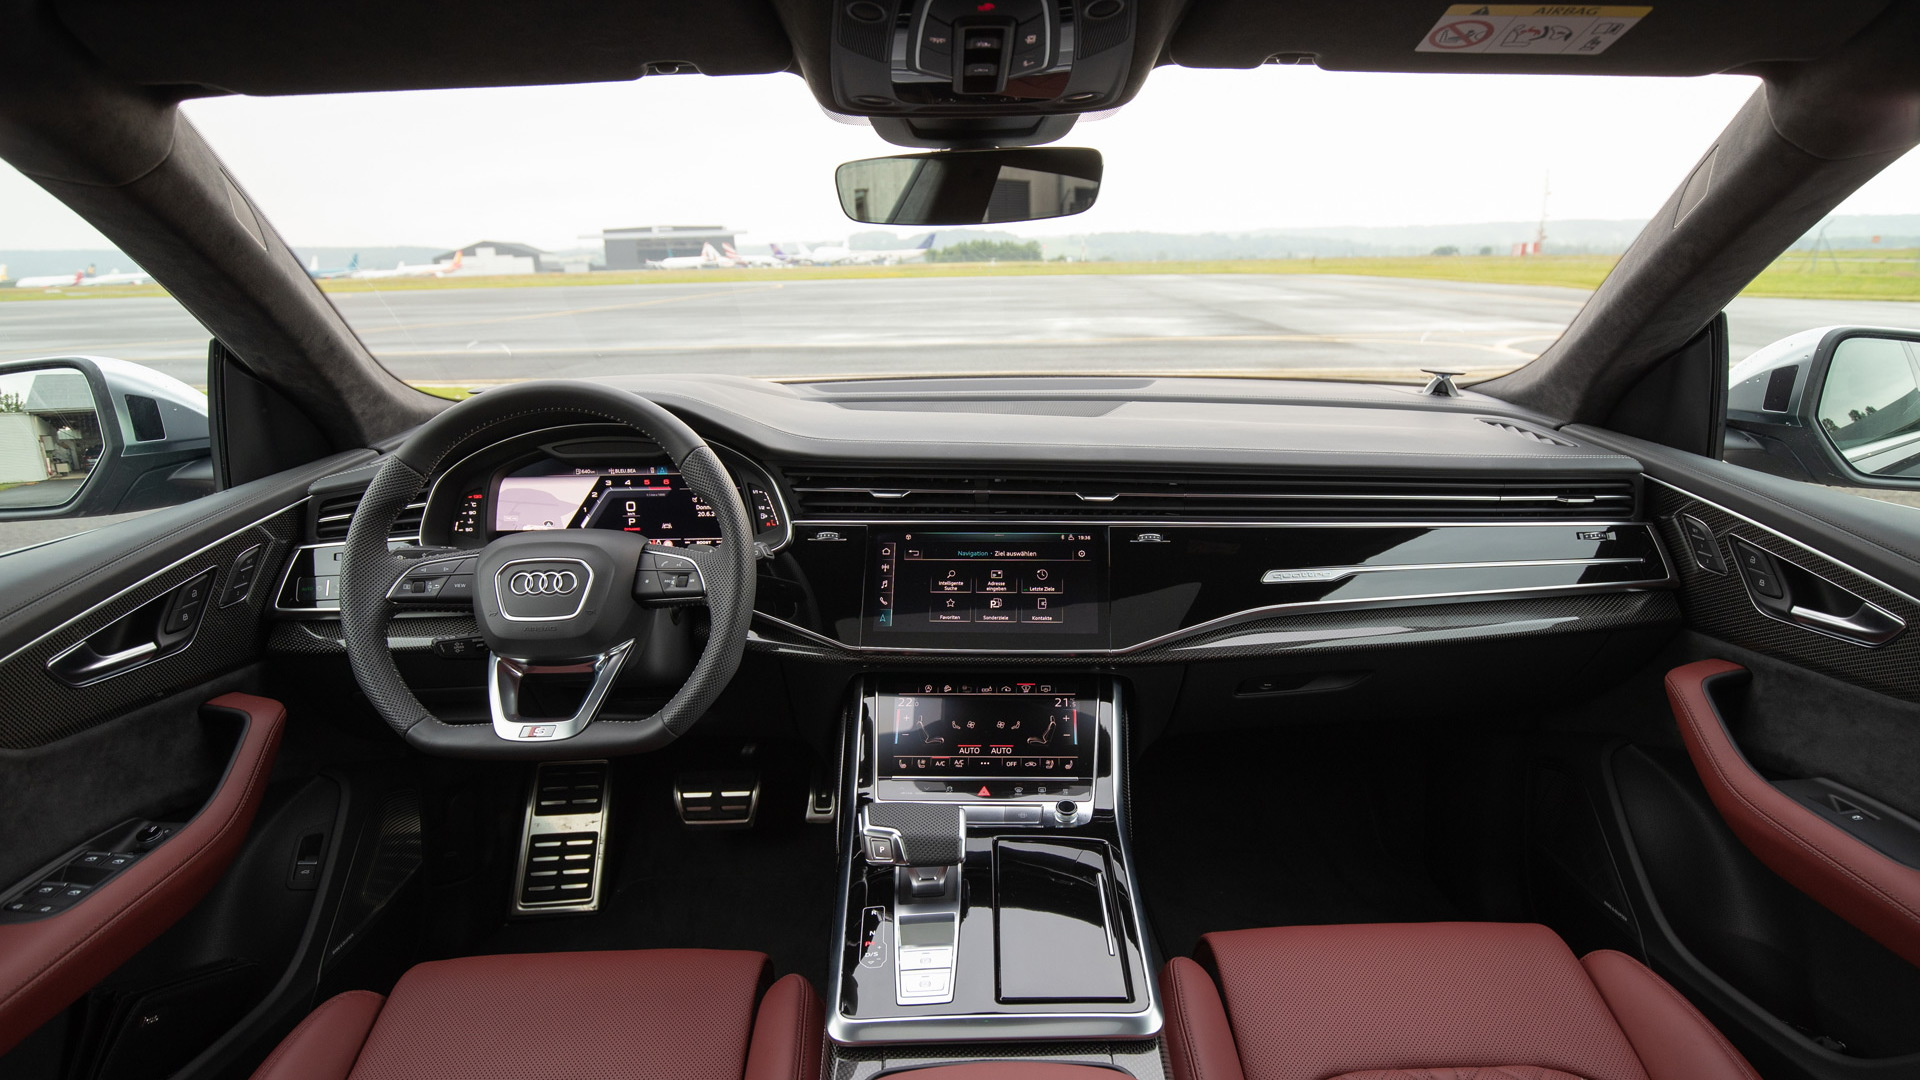 Kelebihan Audi Sq8 2019 Tangguh